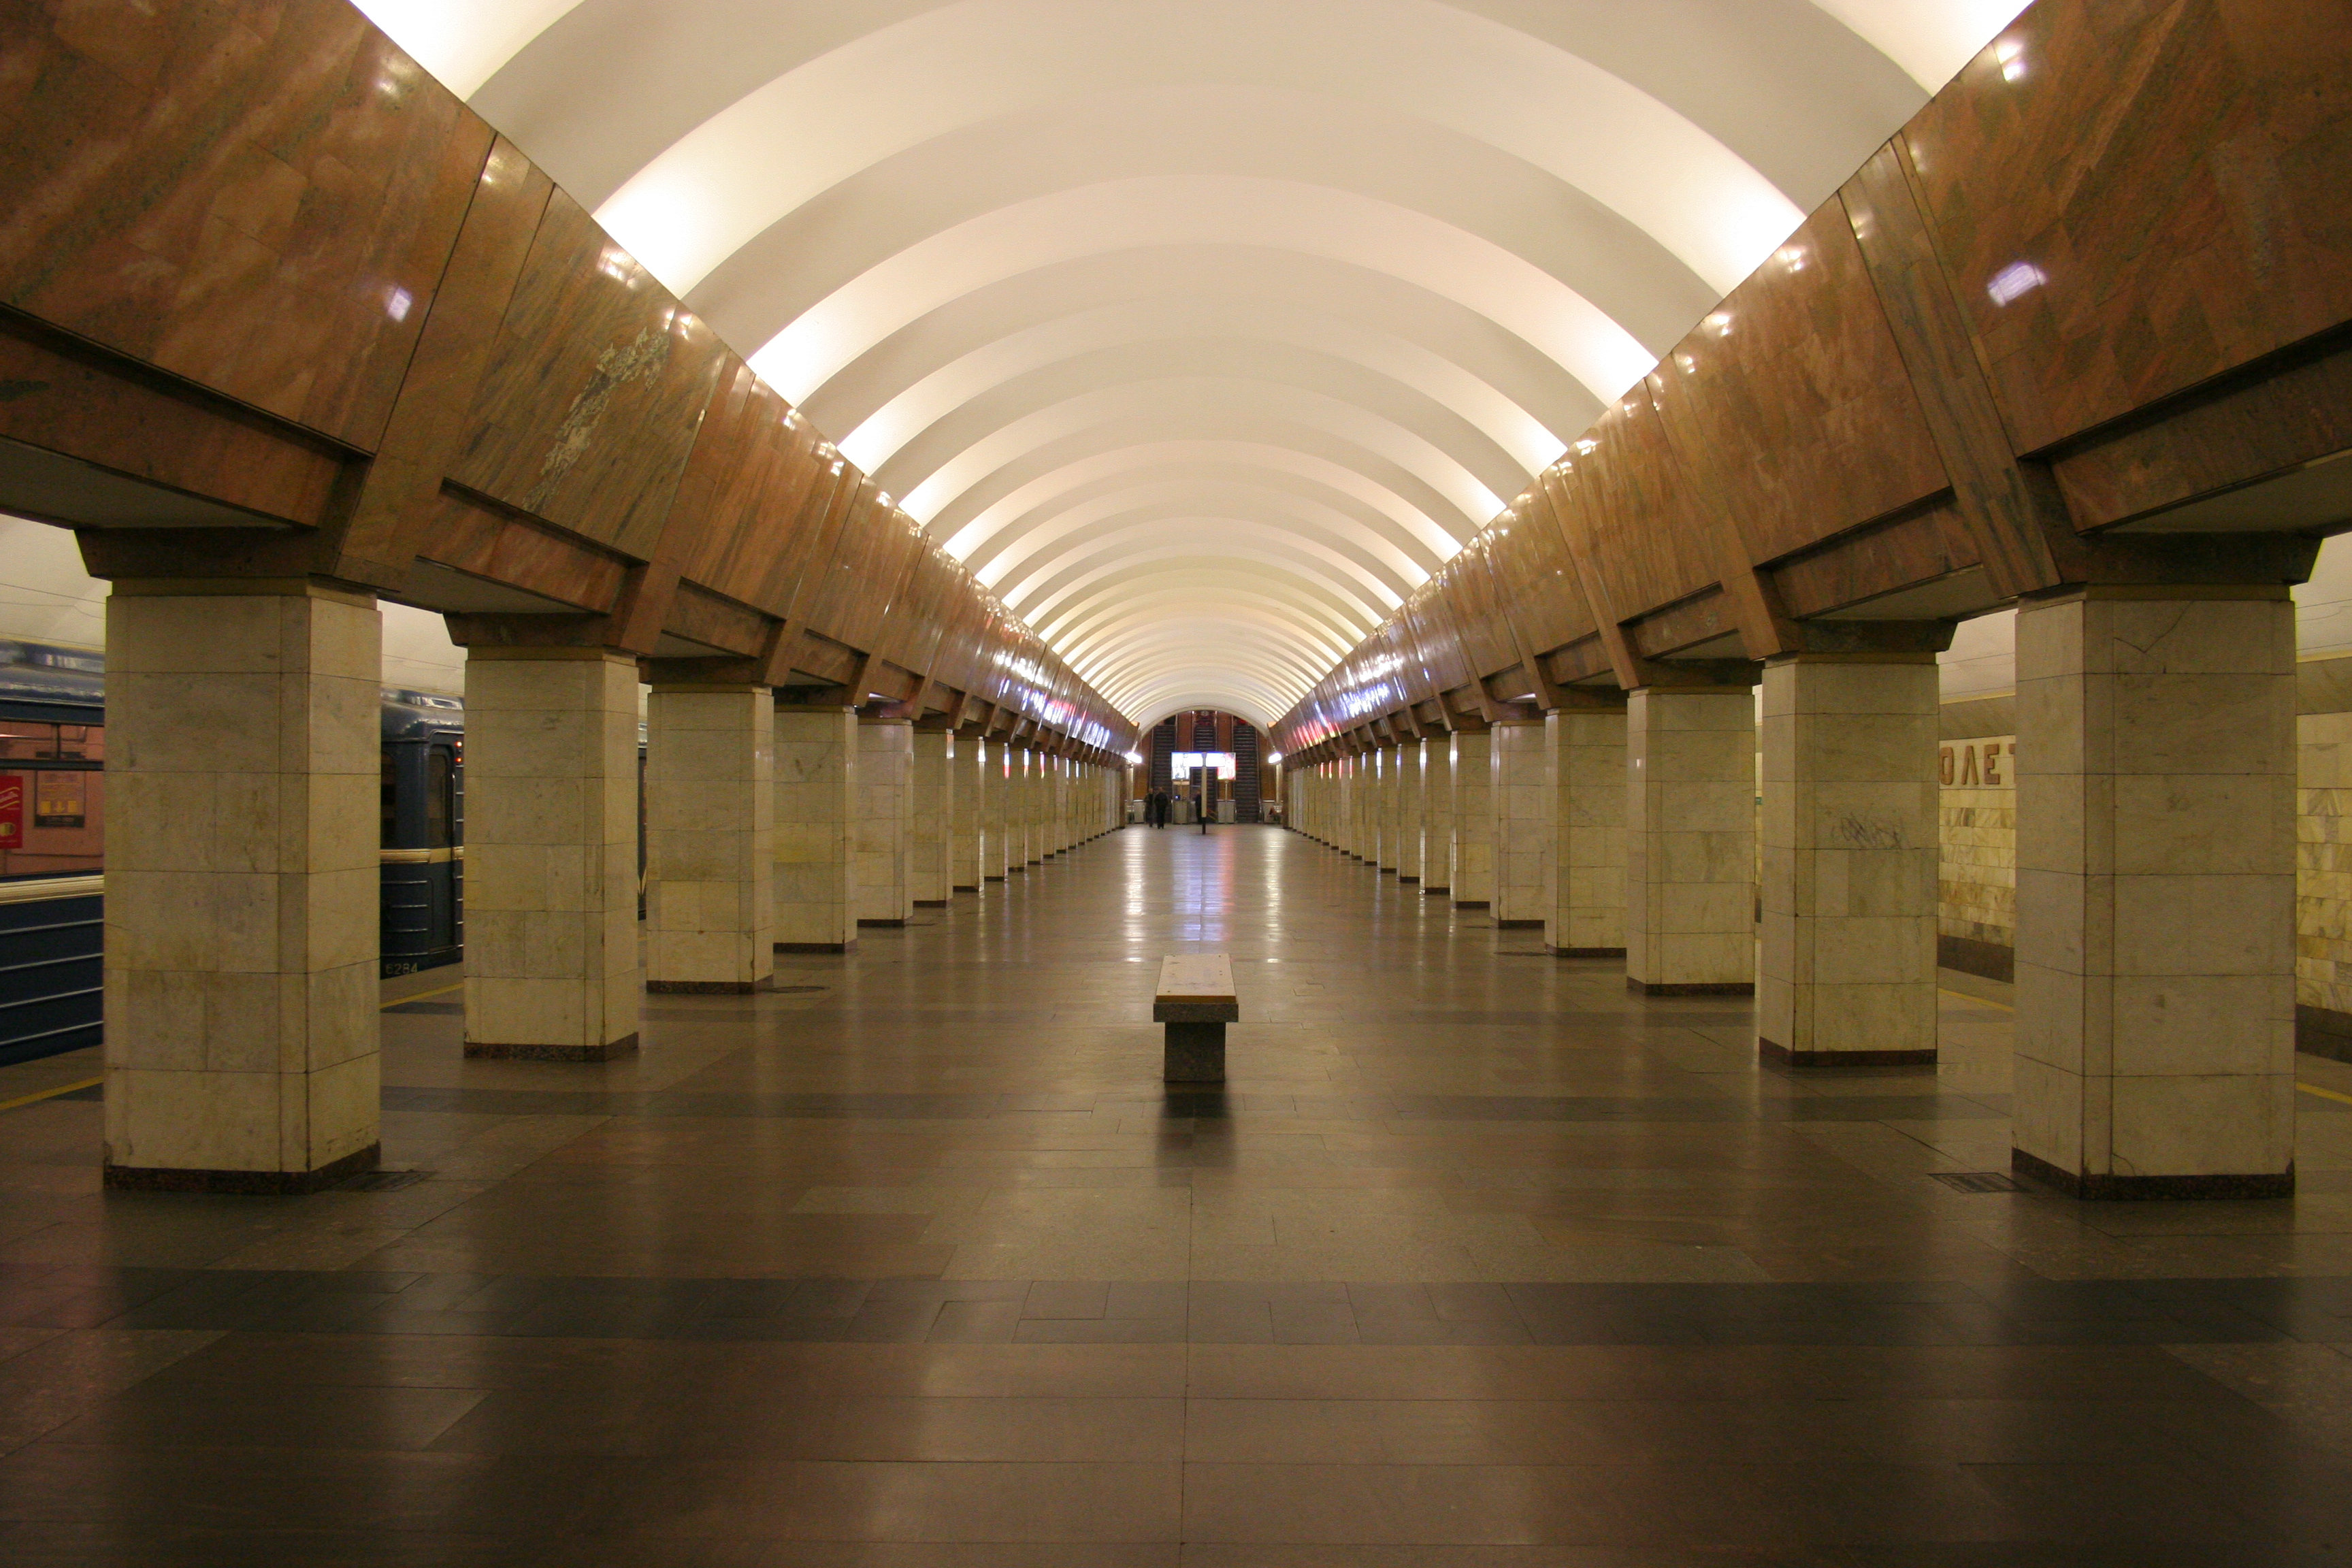 проститутки санкт петербурга со станциями метро